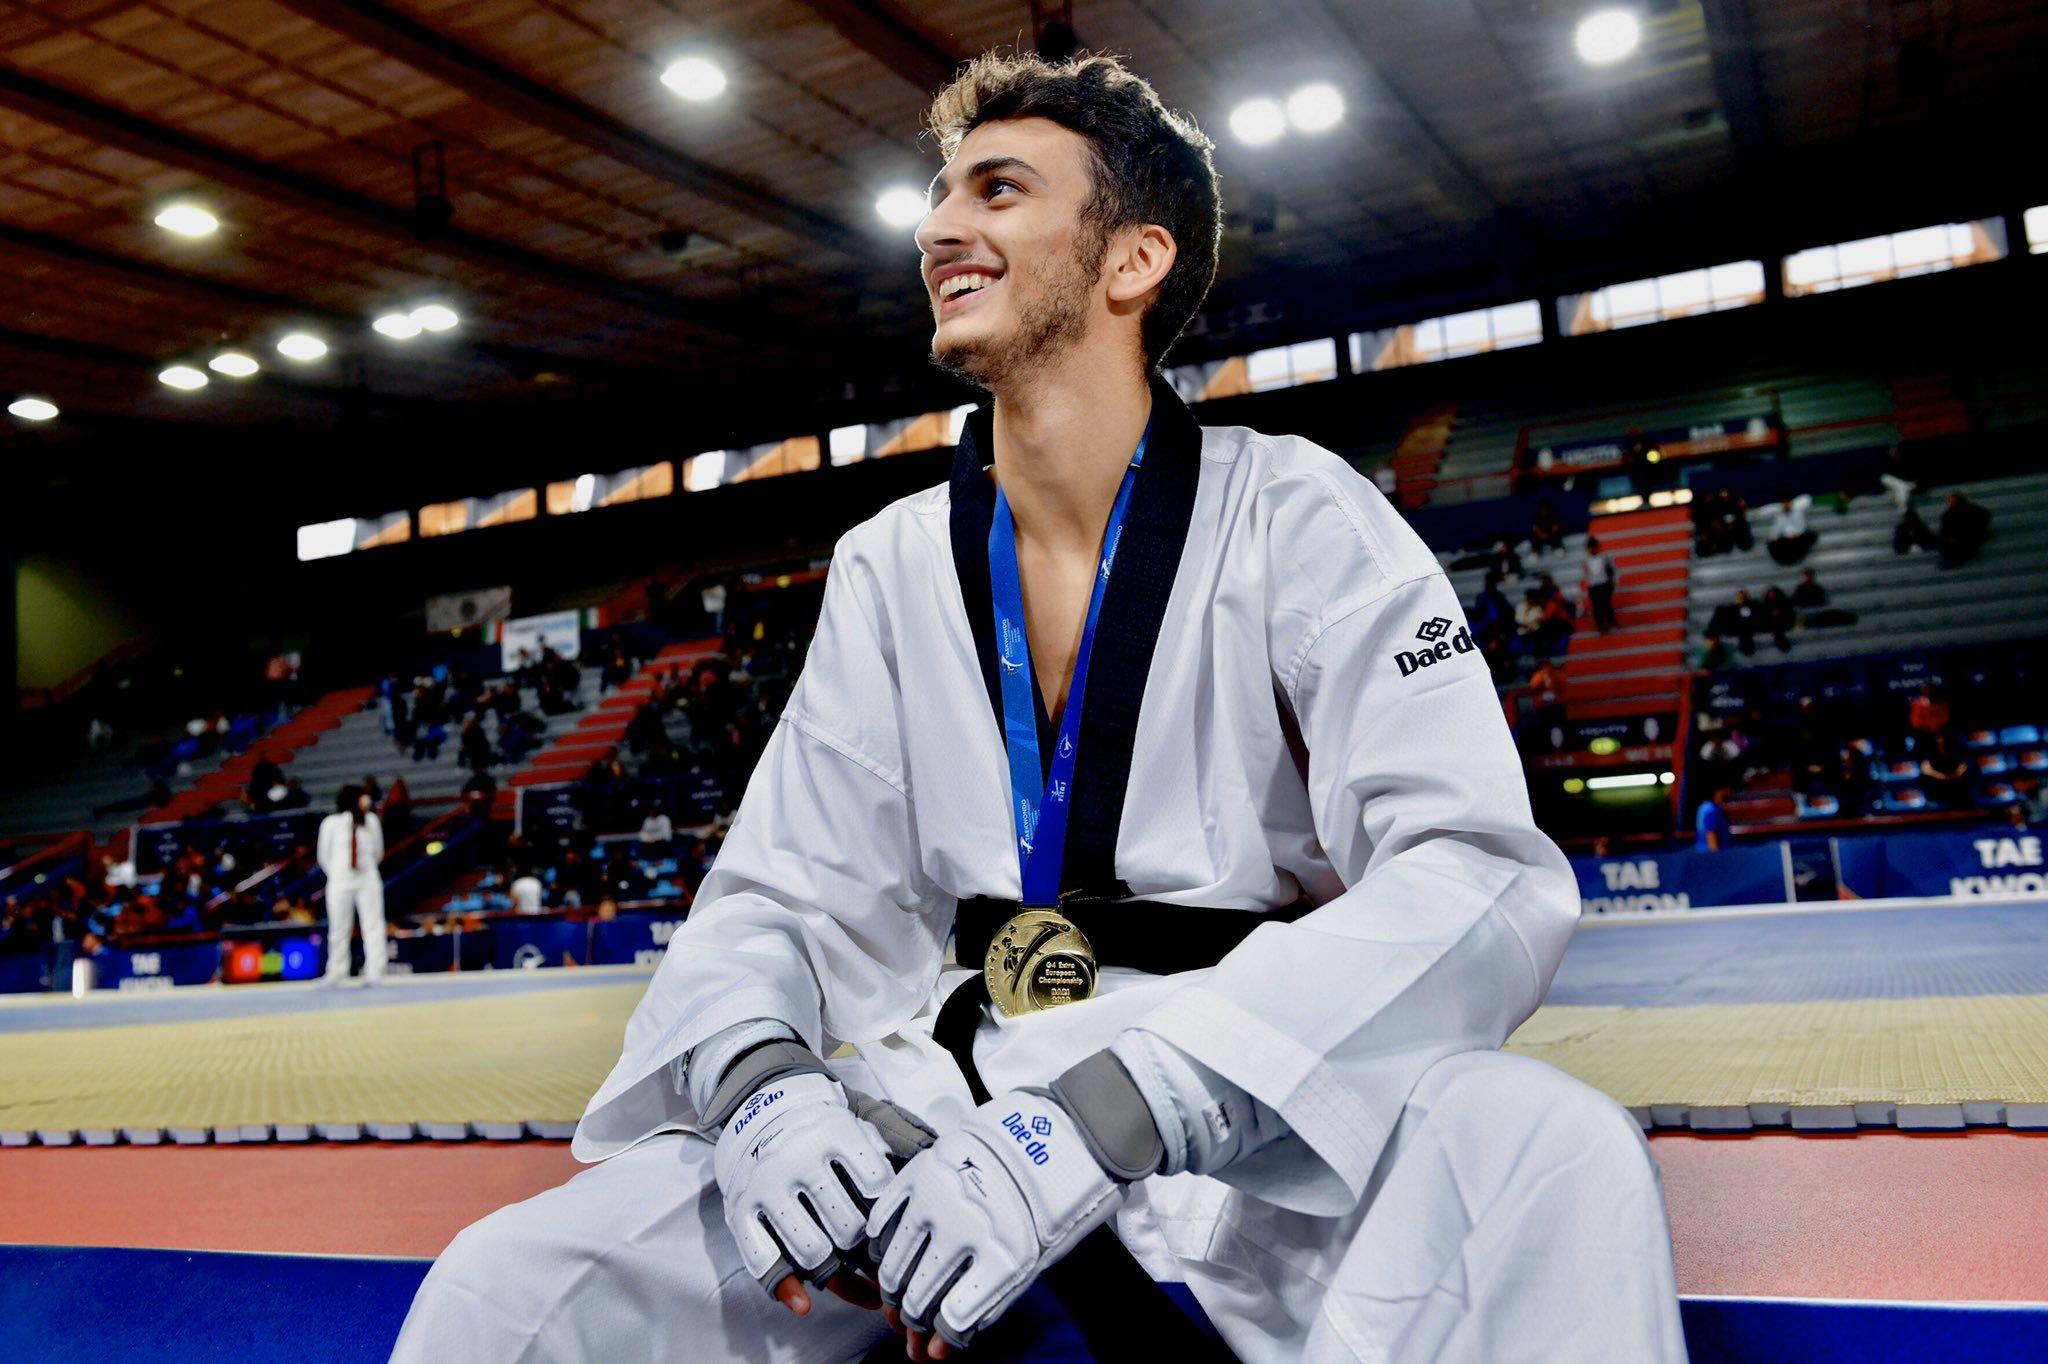 taekwondo europei 2019 bari vito dell'aquila oro italia italy taekwondo european championships campionati europei 2019 palaflorio golden gold categoria -58 kg maschile